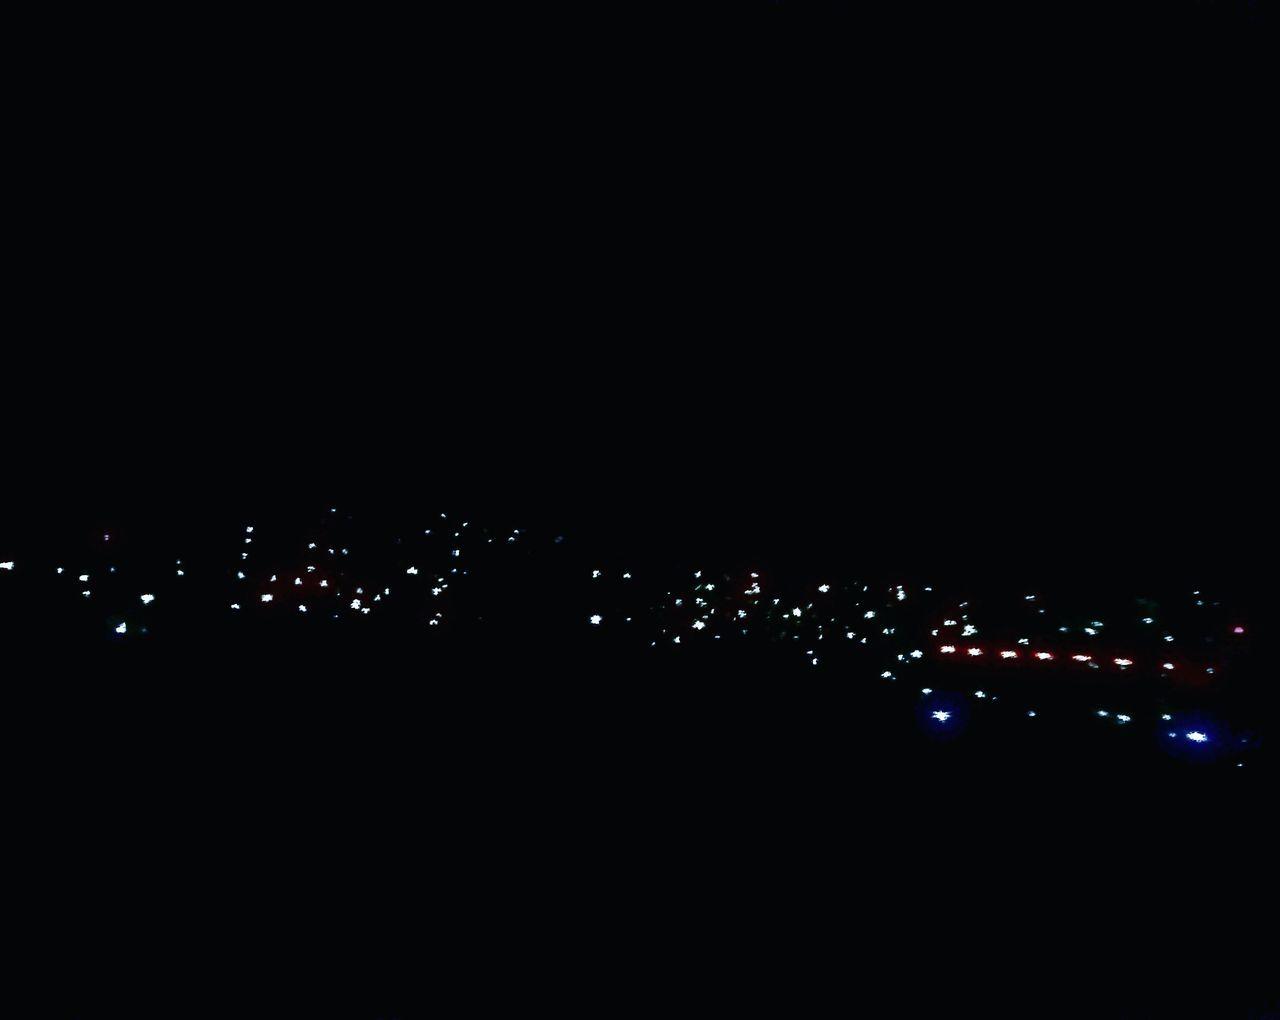 Ligths City Landscape Night